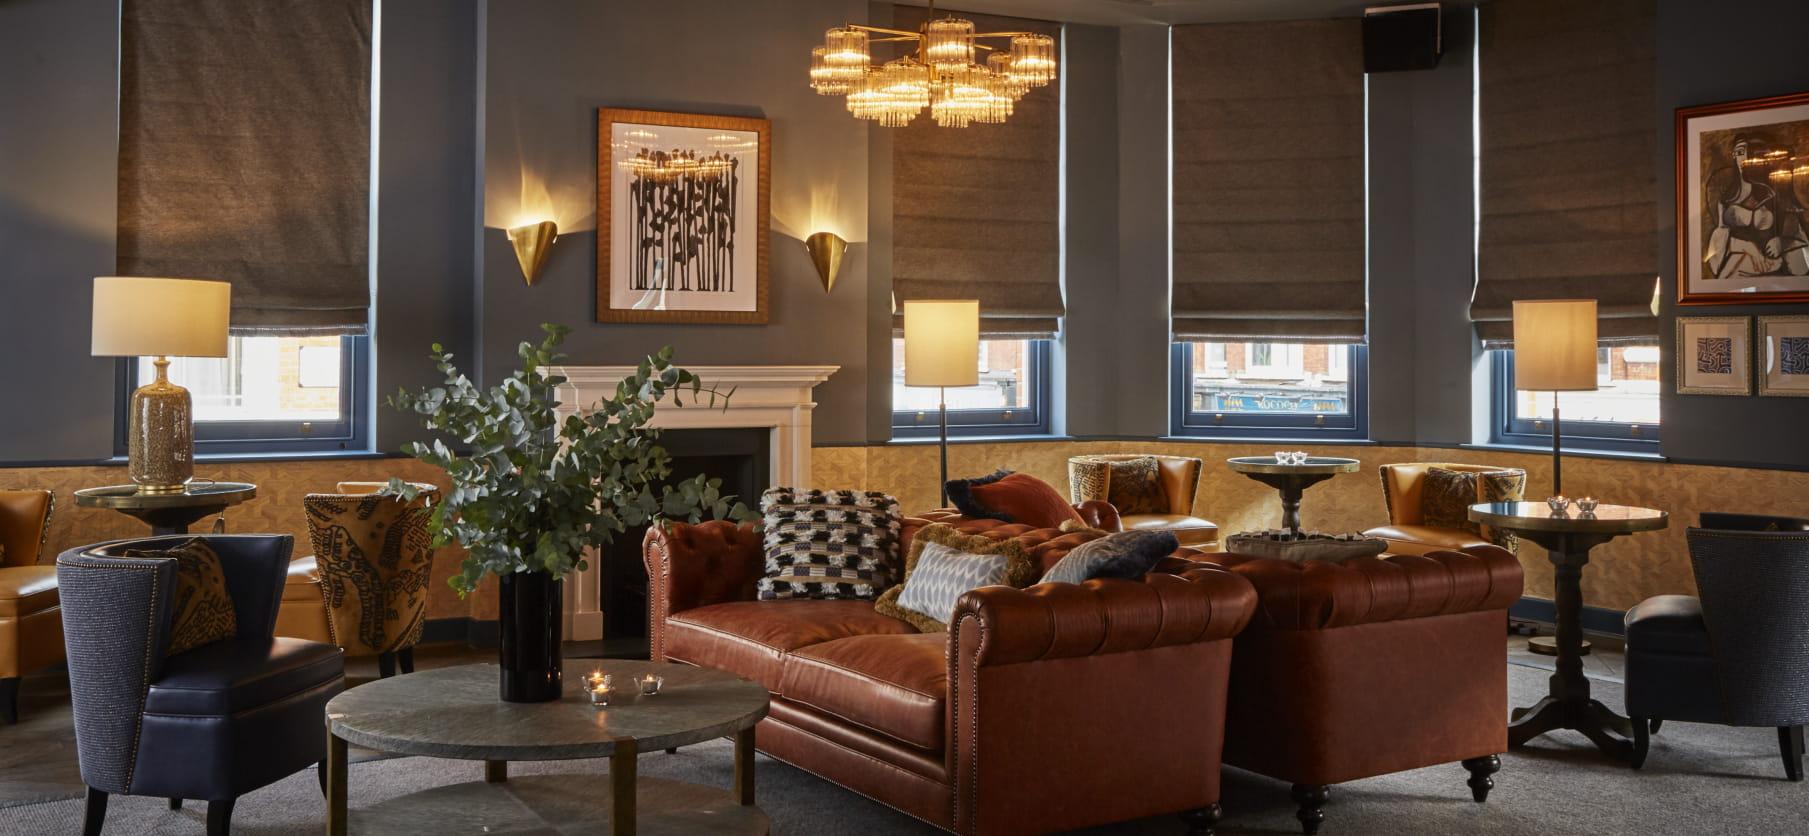 alberts lounge-1 (1).jpg